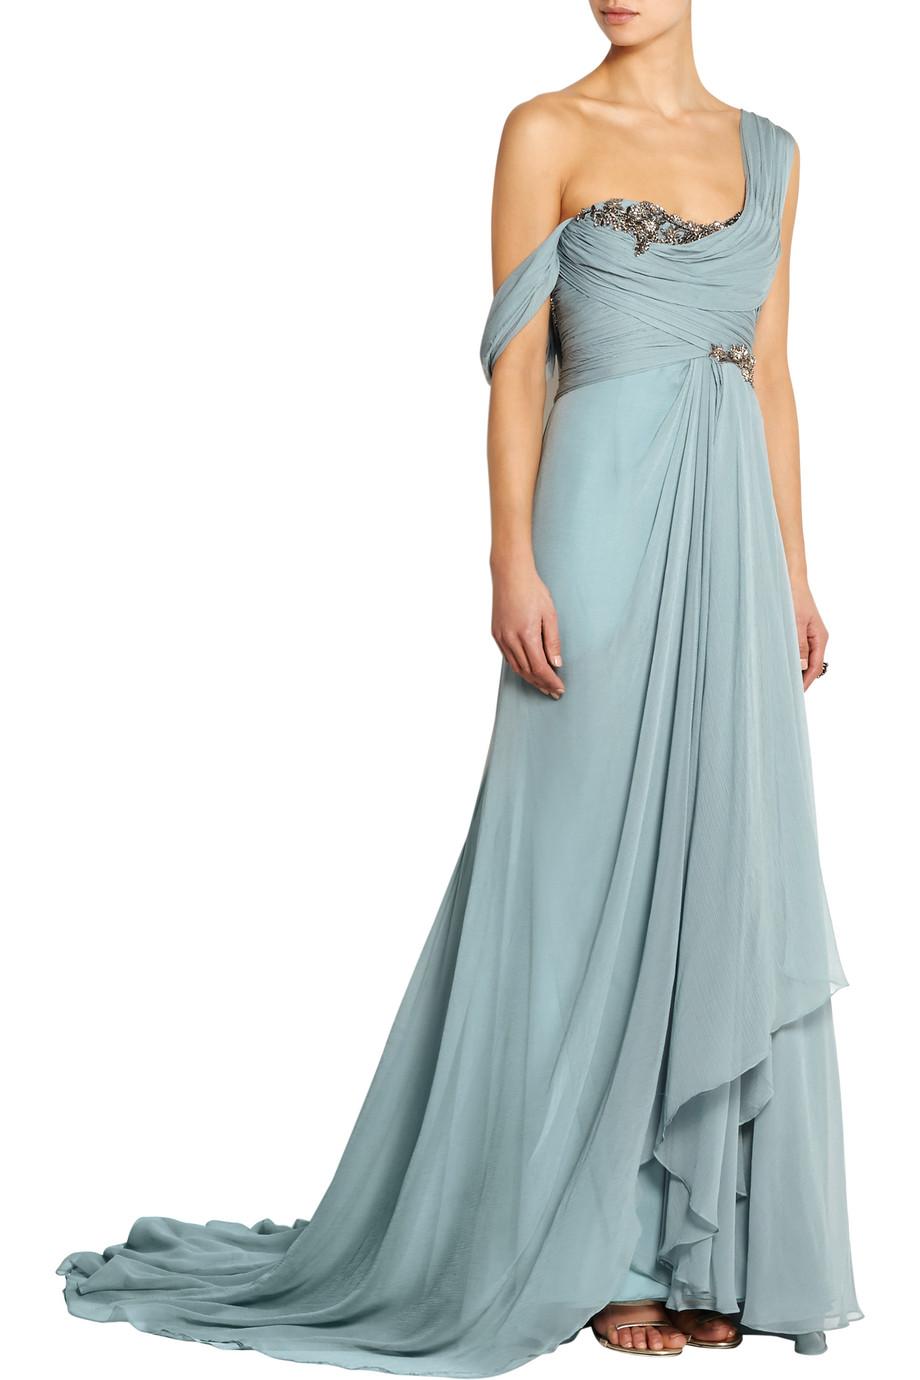 Enchanting Polyvore Party Dresses Vignette - All Wedding Dresses ...